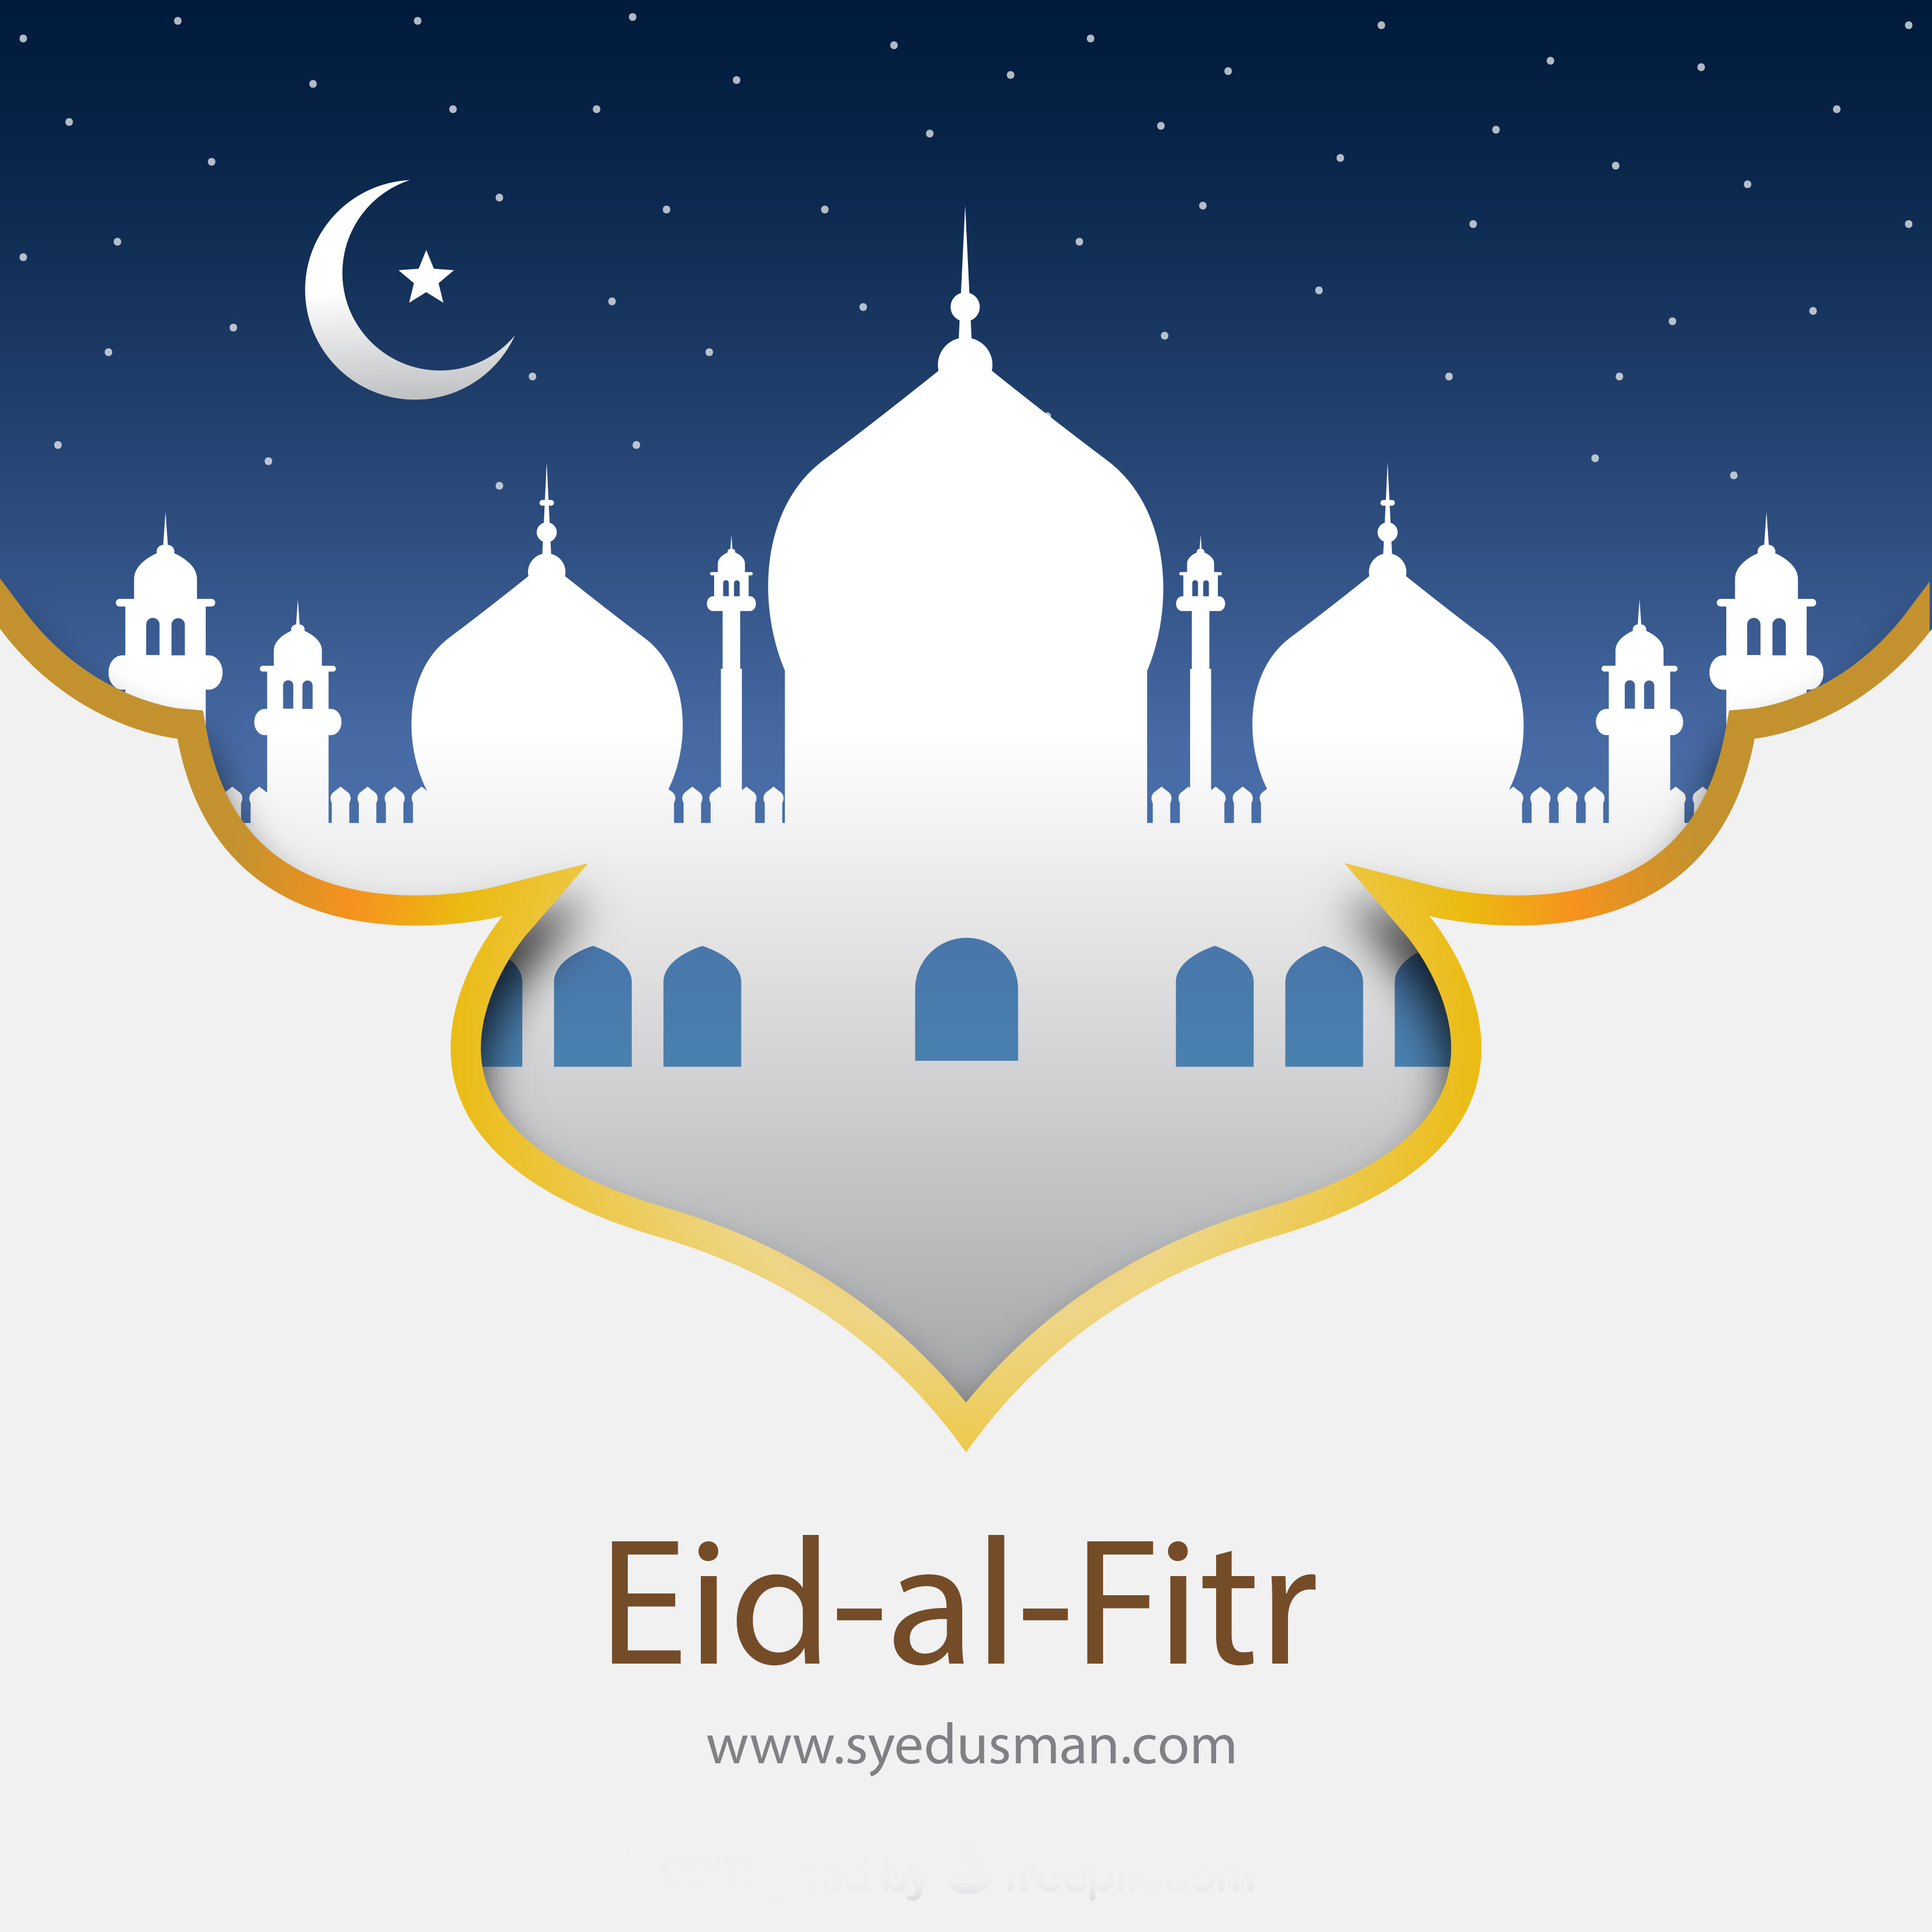 Eid 2016 Wishes